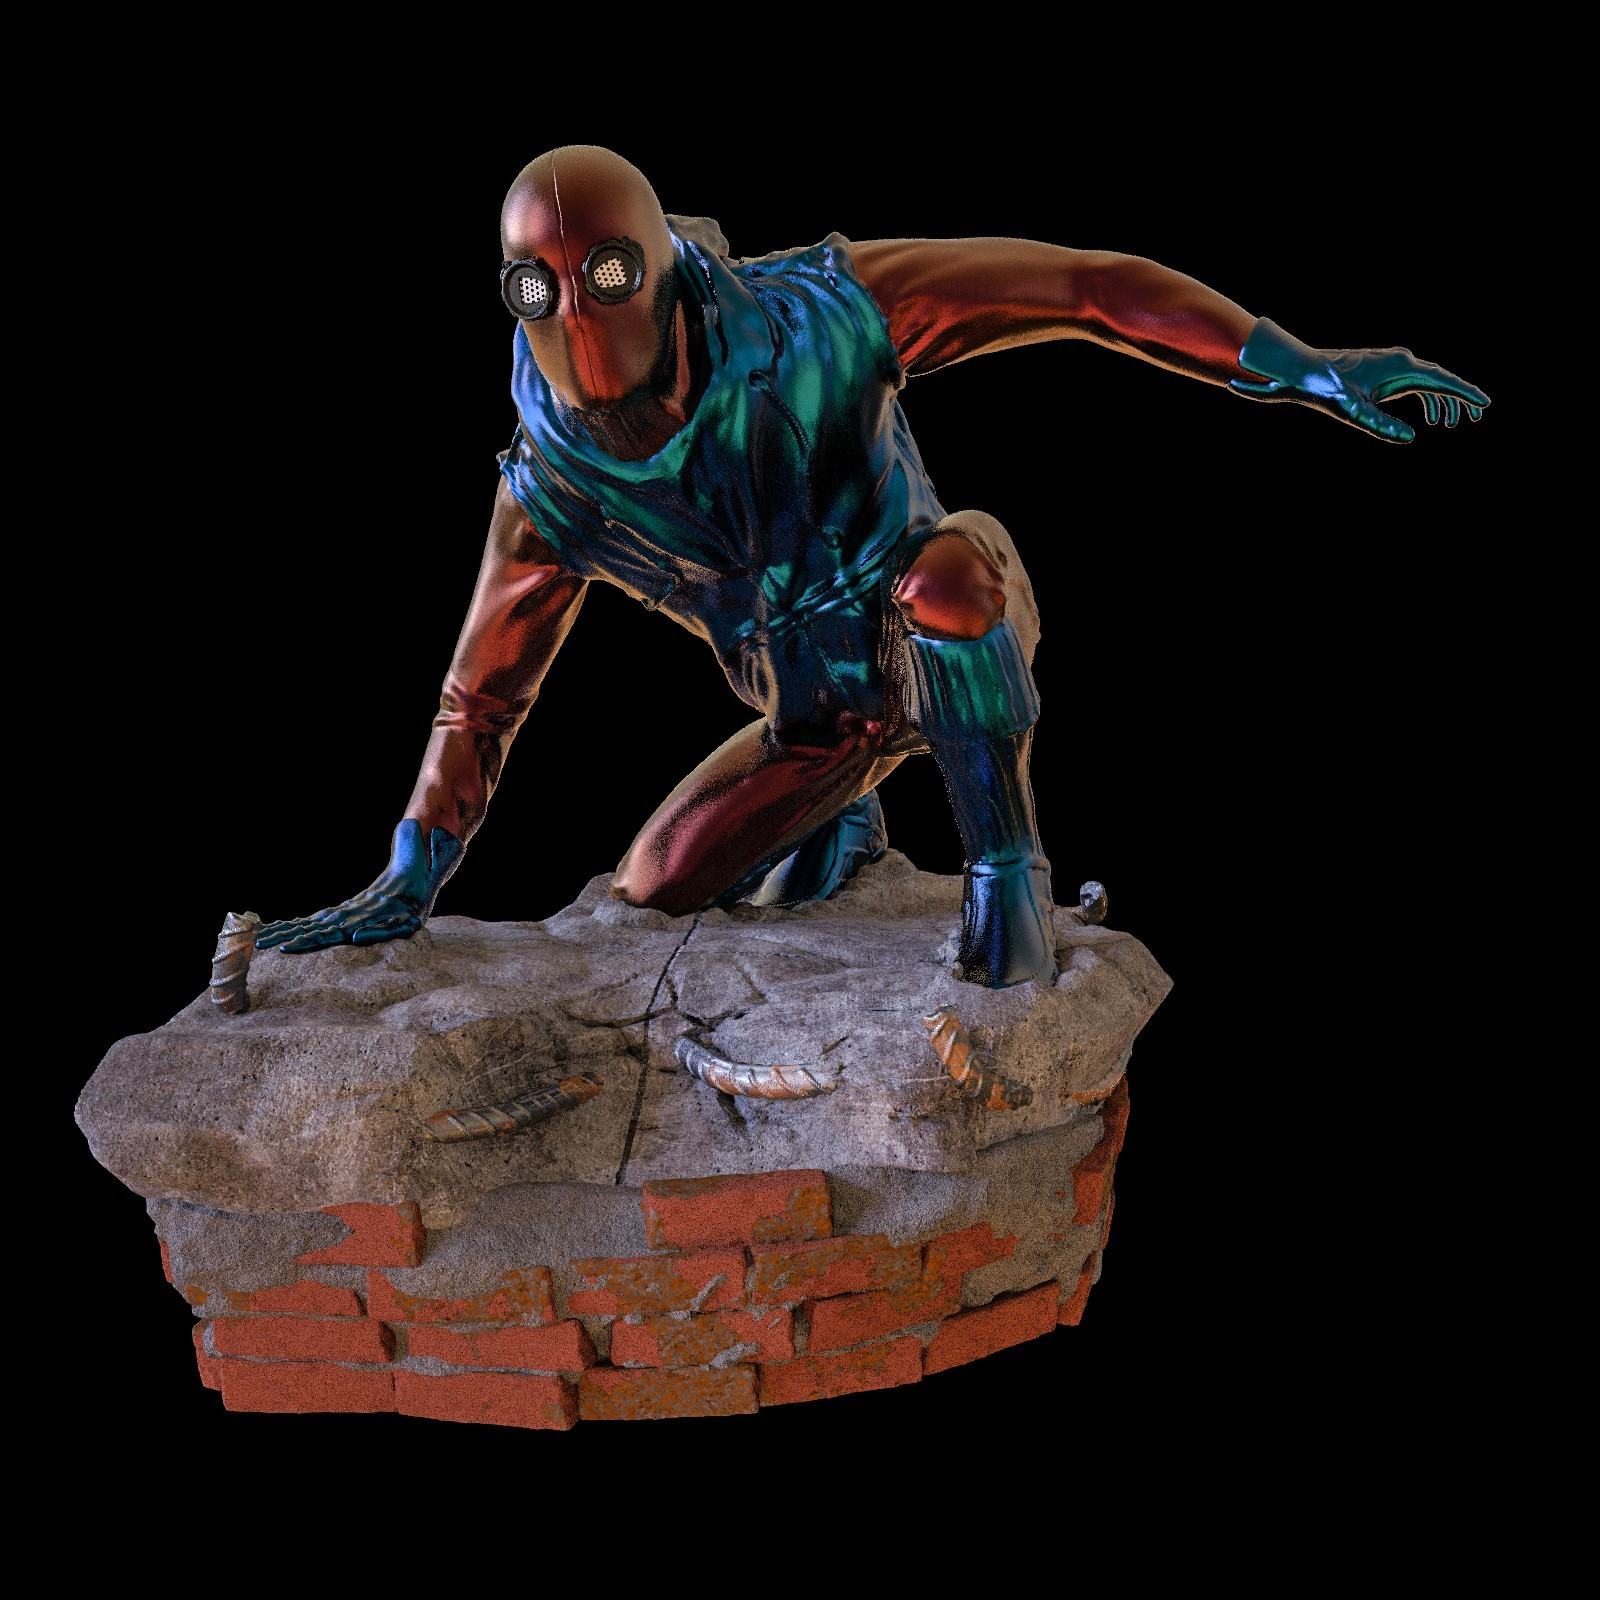 22.jpg Download STL file Spider-Man Homemade Suit • Design to 3D print, tolgaaxu